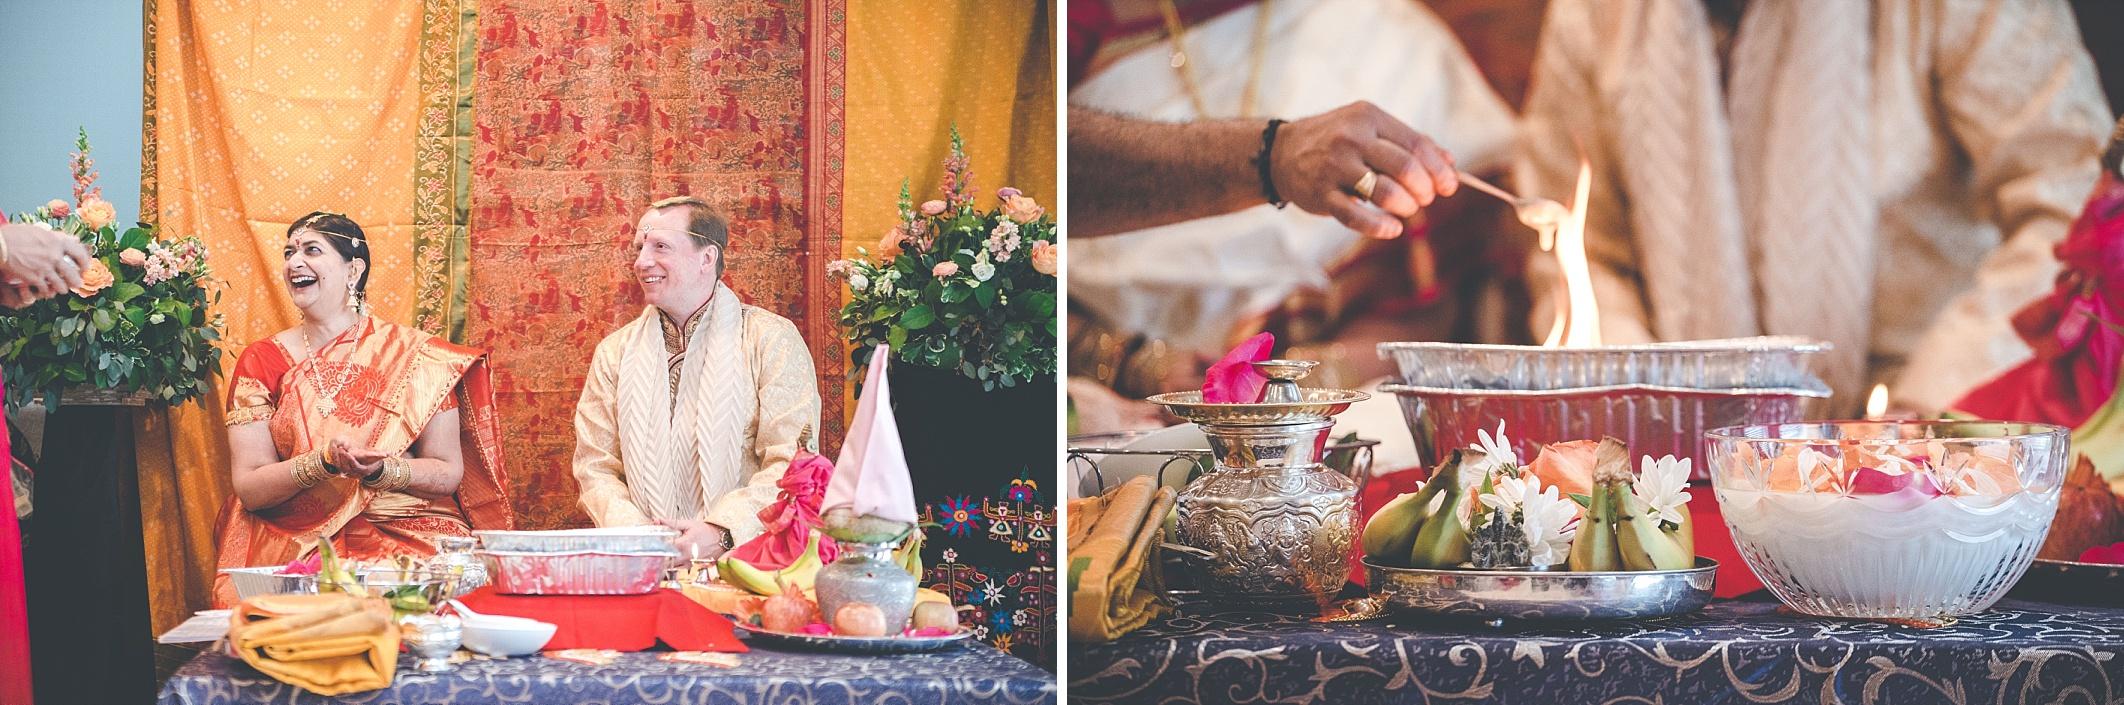 2684_dayton-indian-wedding-photographer-beavercreek_0039.jpg